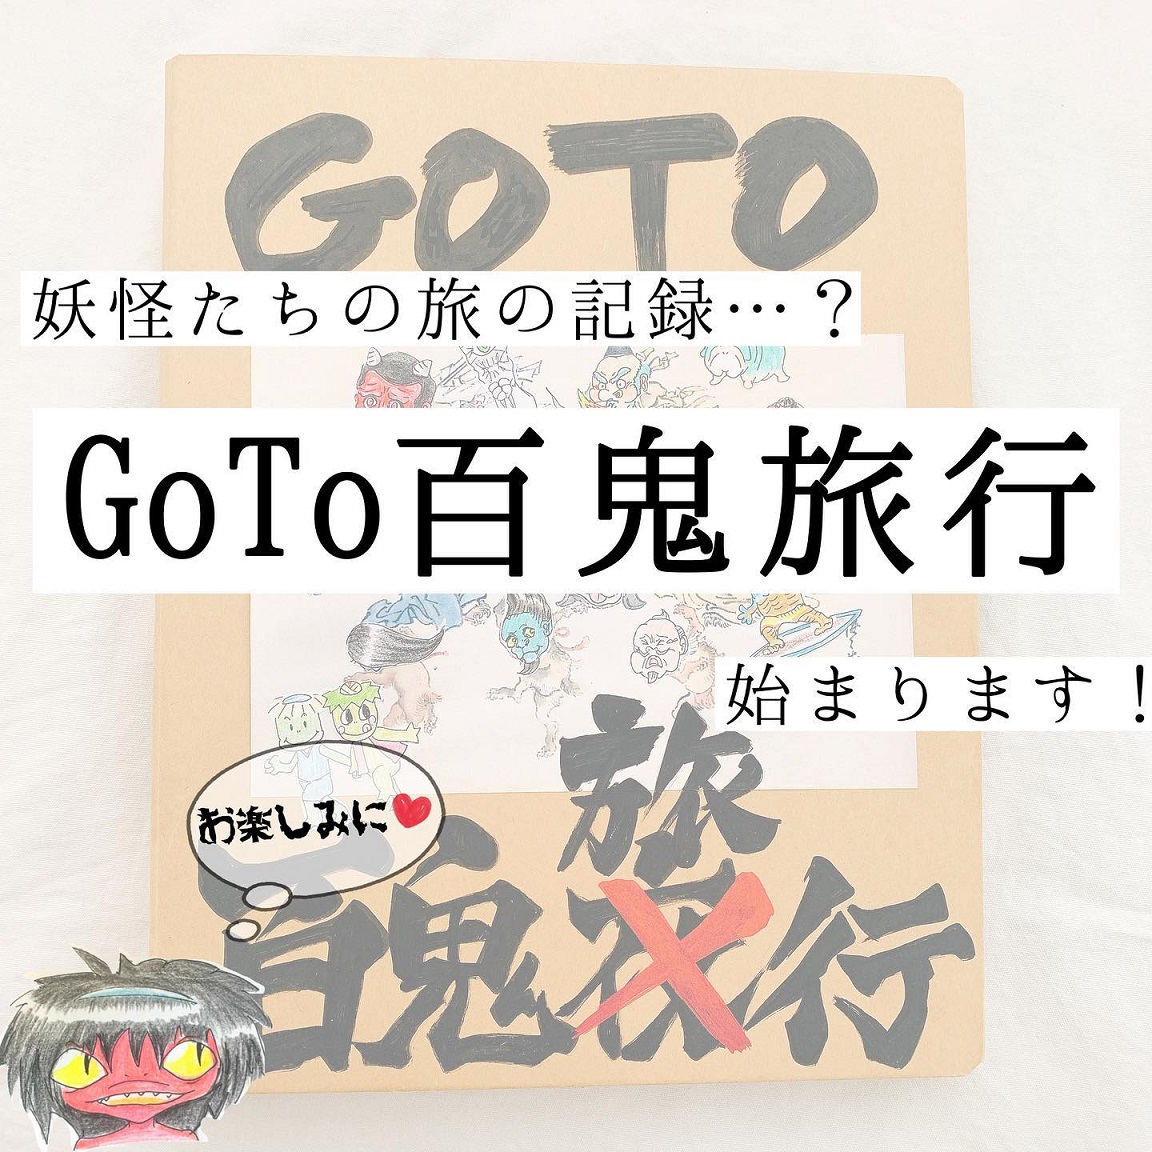 Go To 百鬼旅行|福崎町の妖怪たちが兵庫県内に行った記録を近日公開